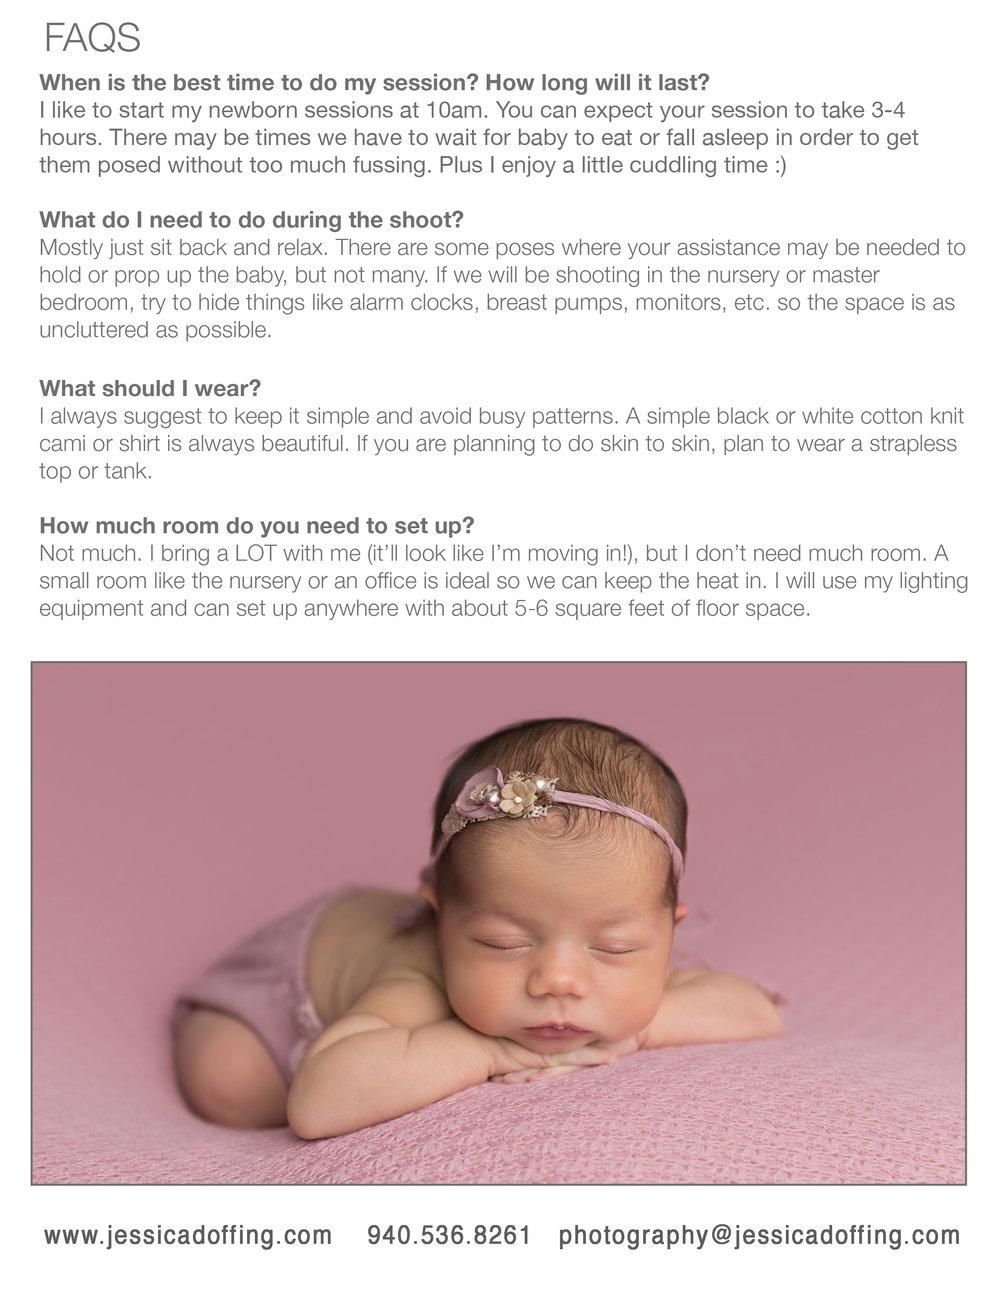 NewbornWelcomeGuide_2018 _page4.jpg